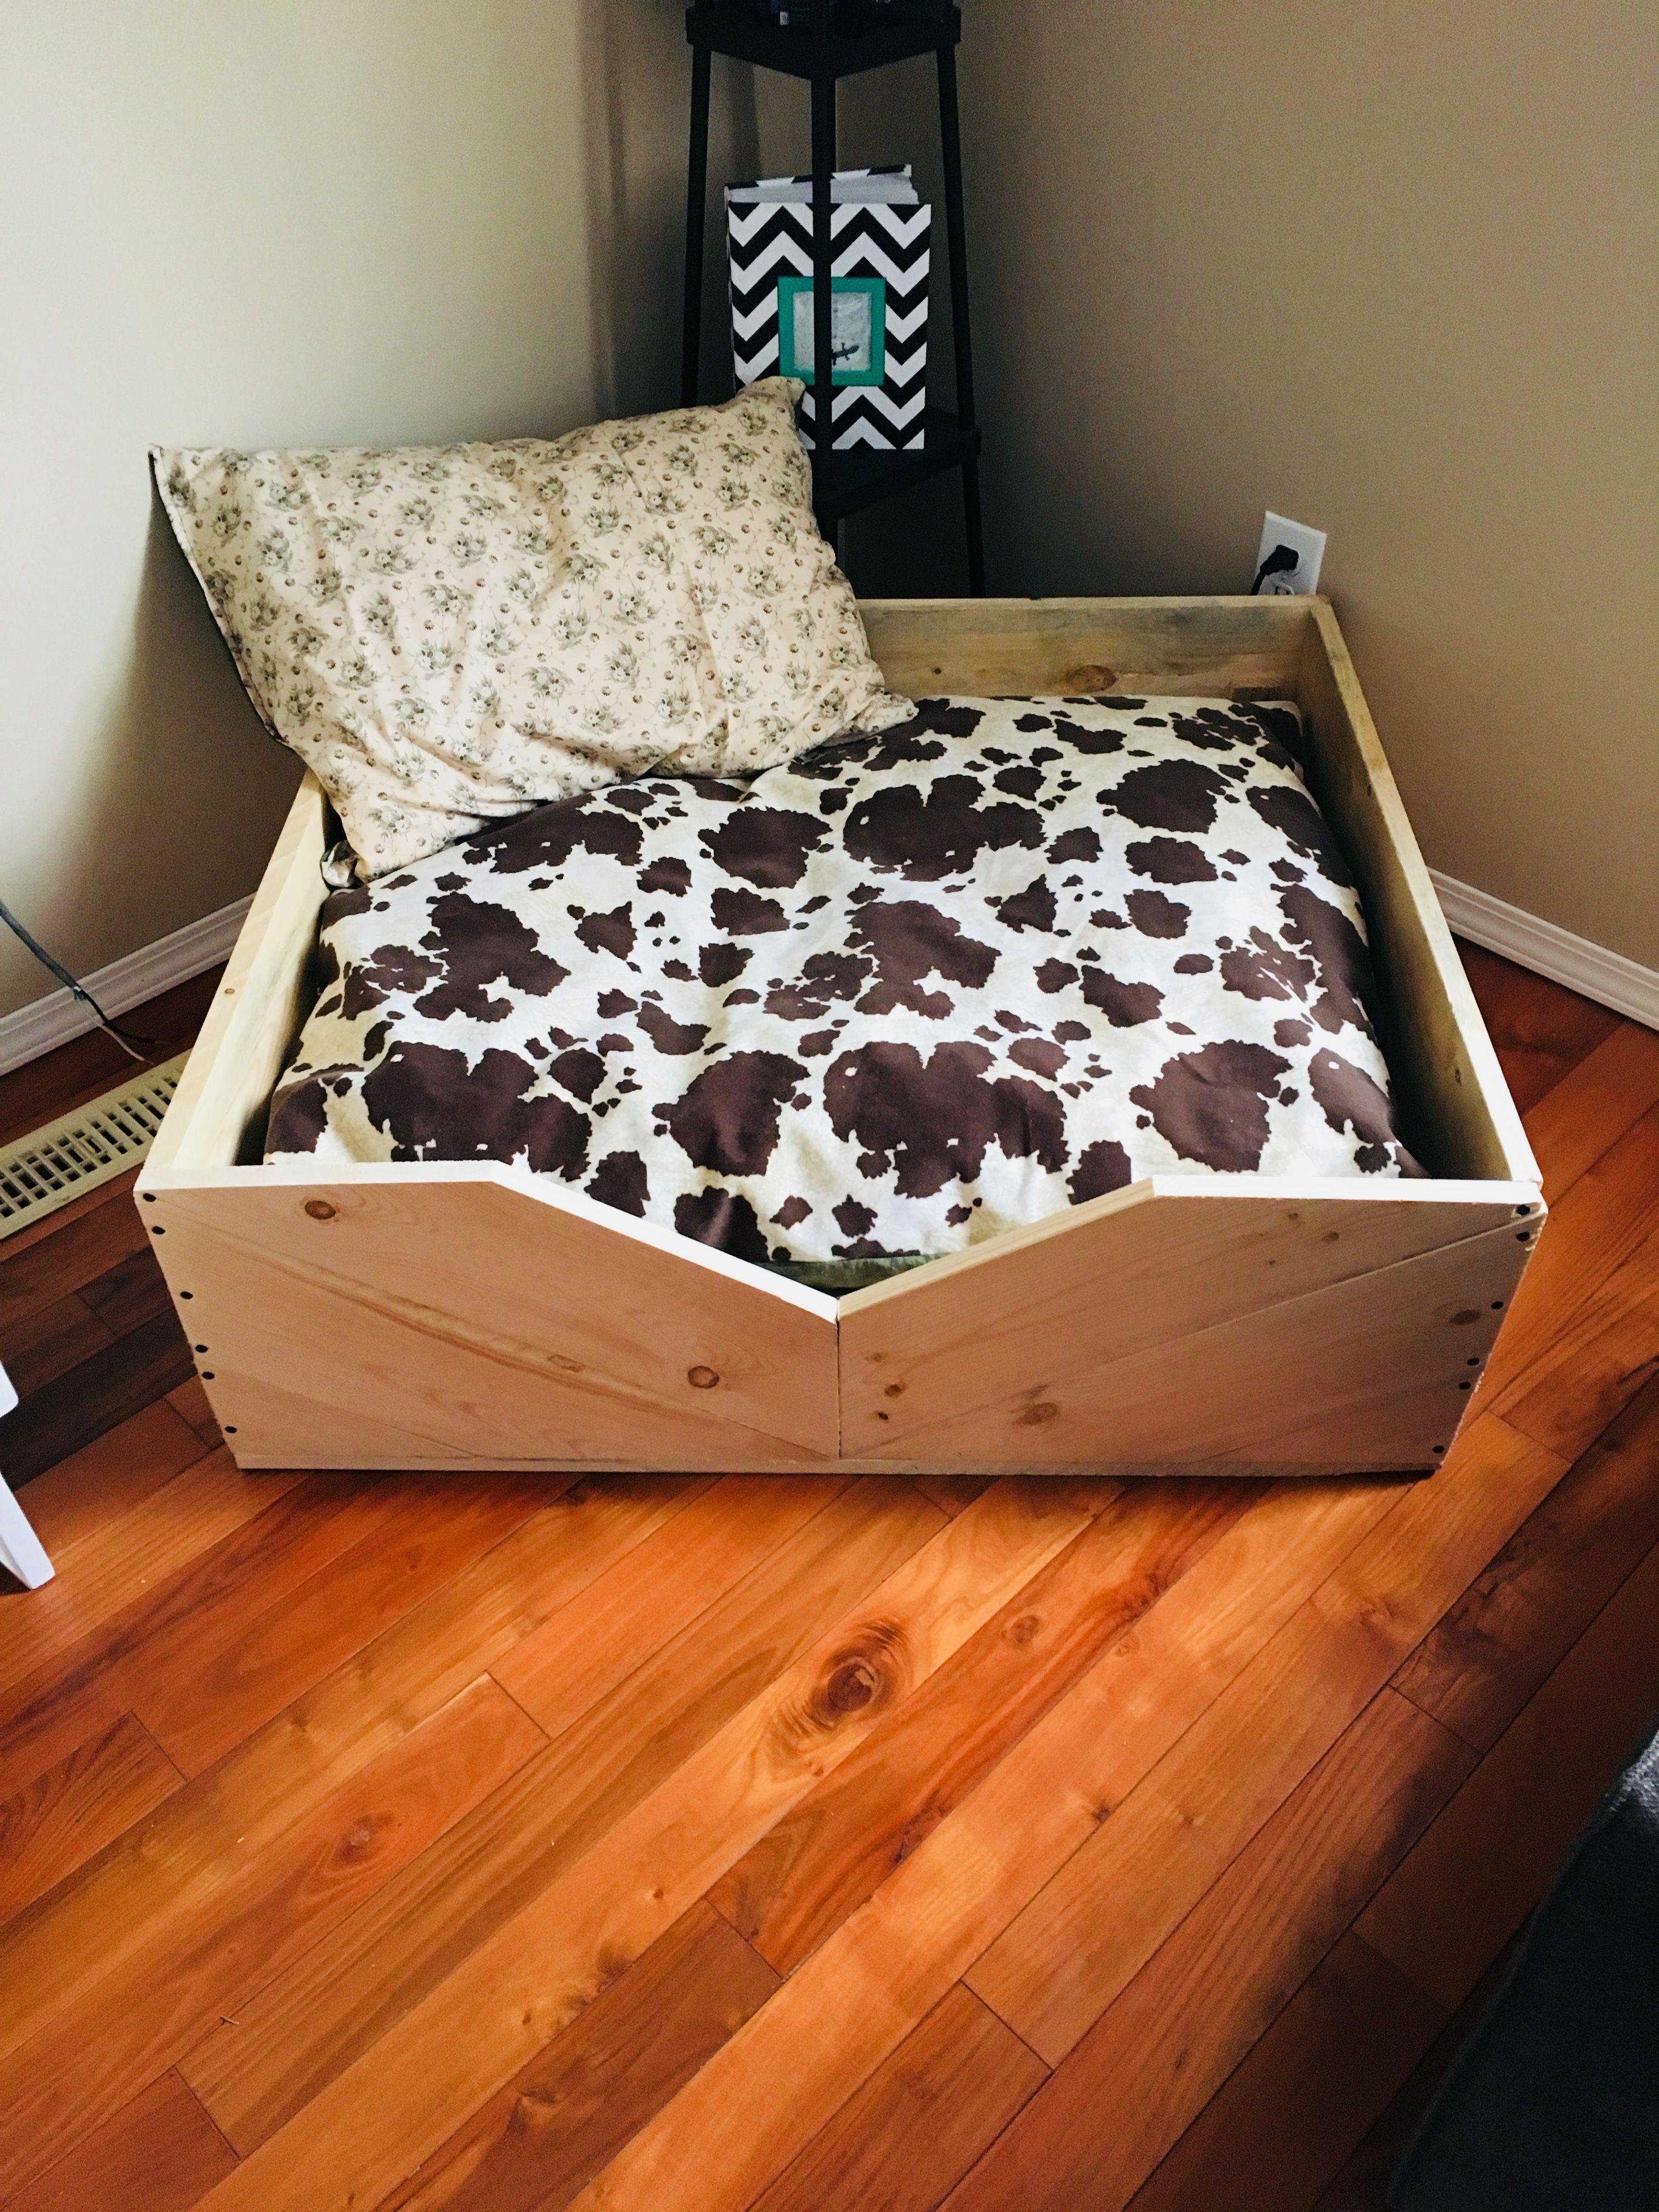 diy dog bed pallet wood puppy bed pallet bed cow print diy wood